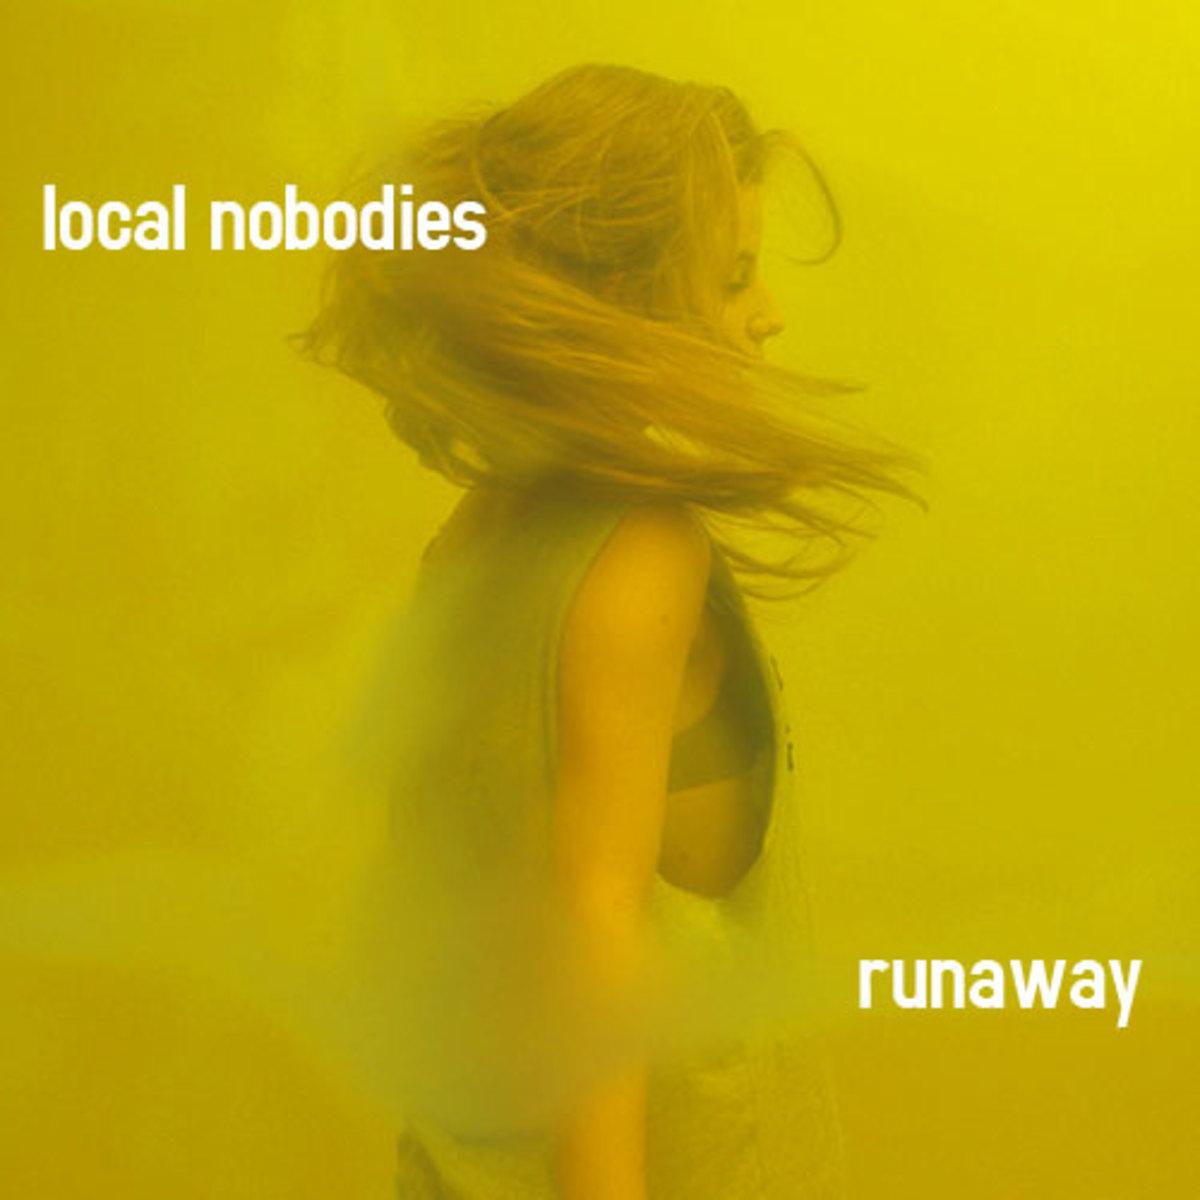 localnobodies-runaway.jpg